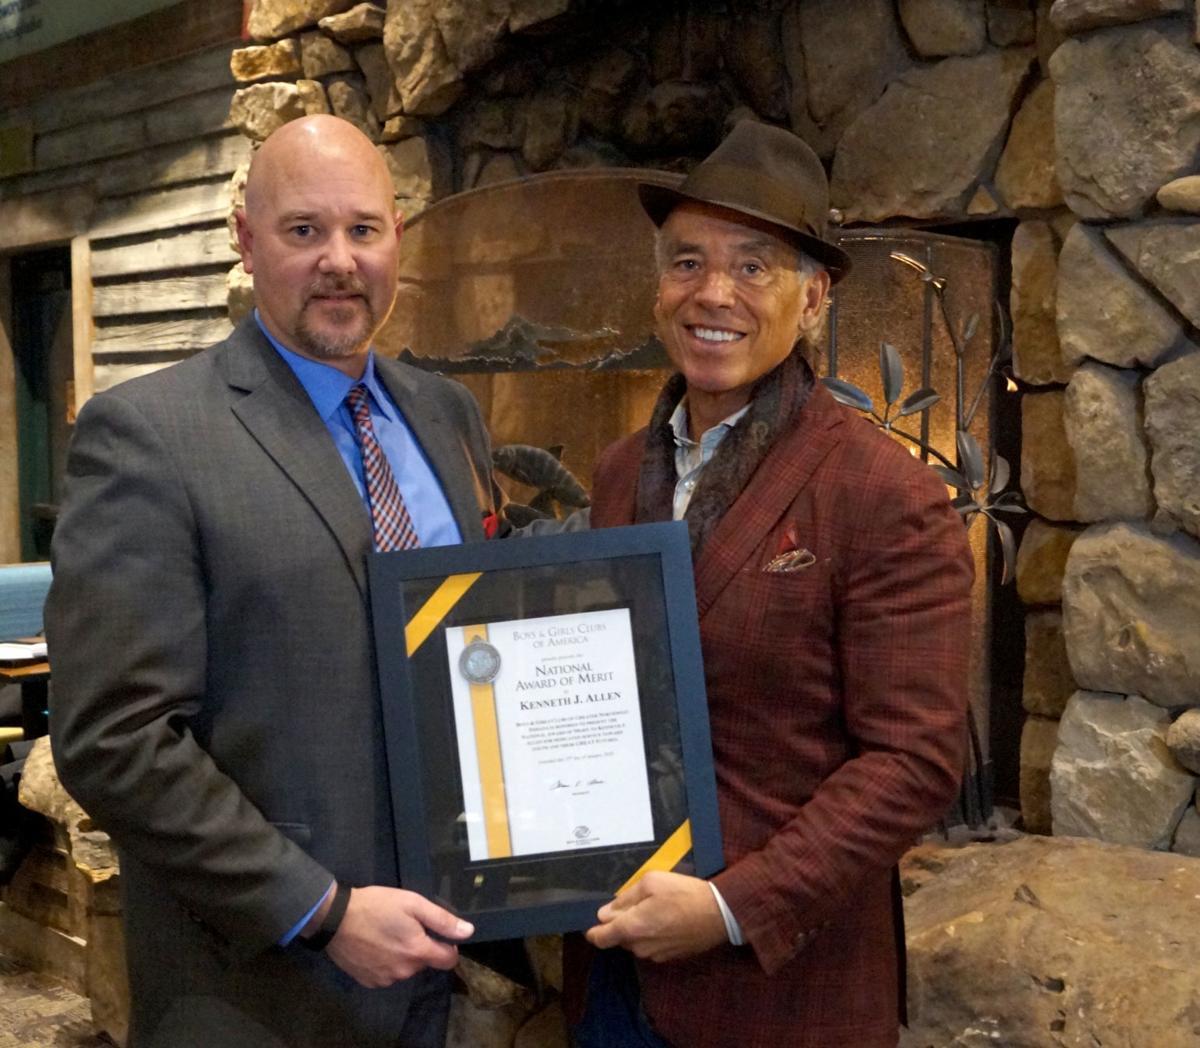 Boys & Girls Club gives Ken Allen National Award of Merit